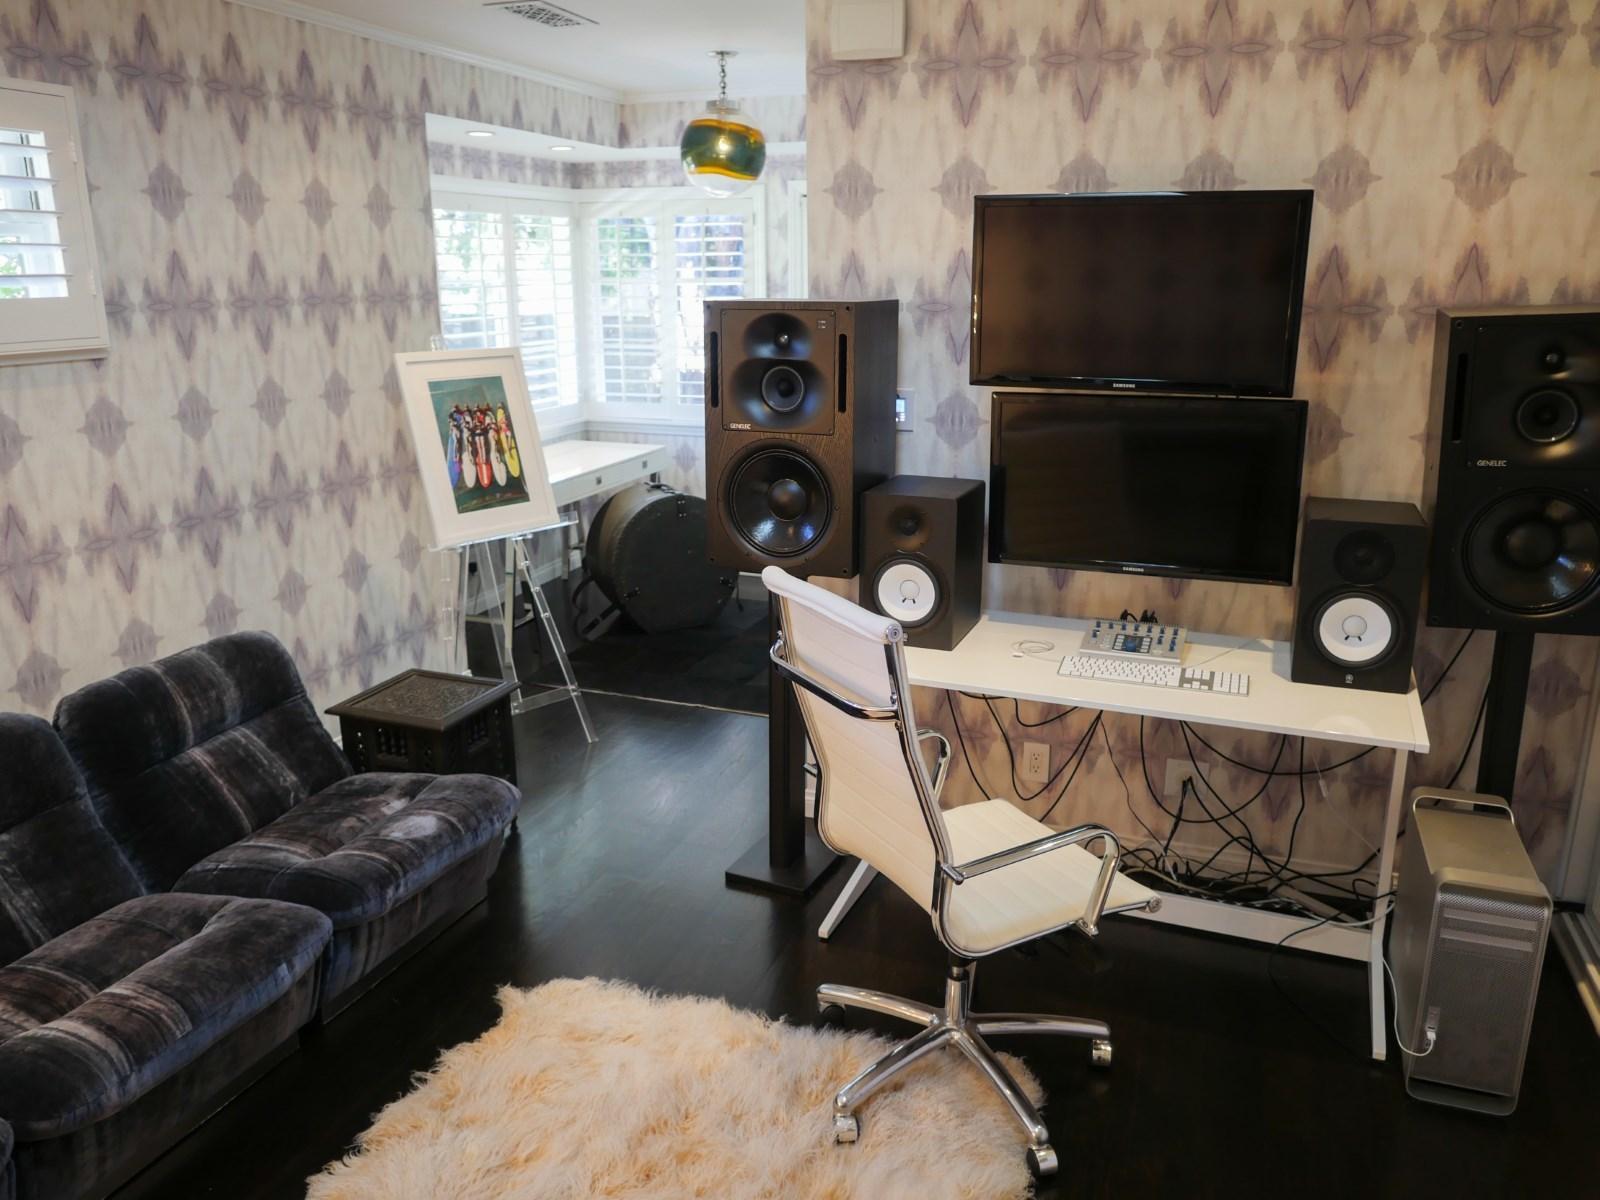 La casa de soltera de Leighton Meester